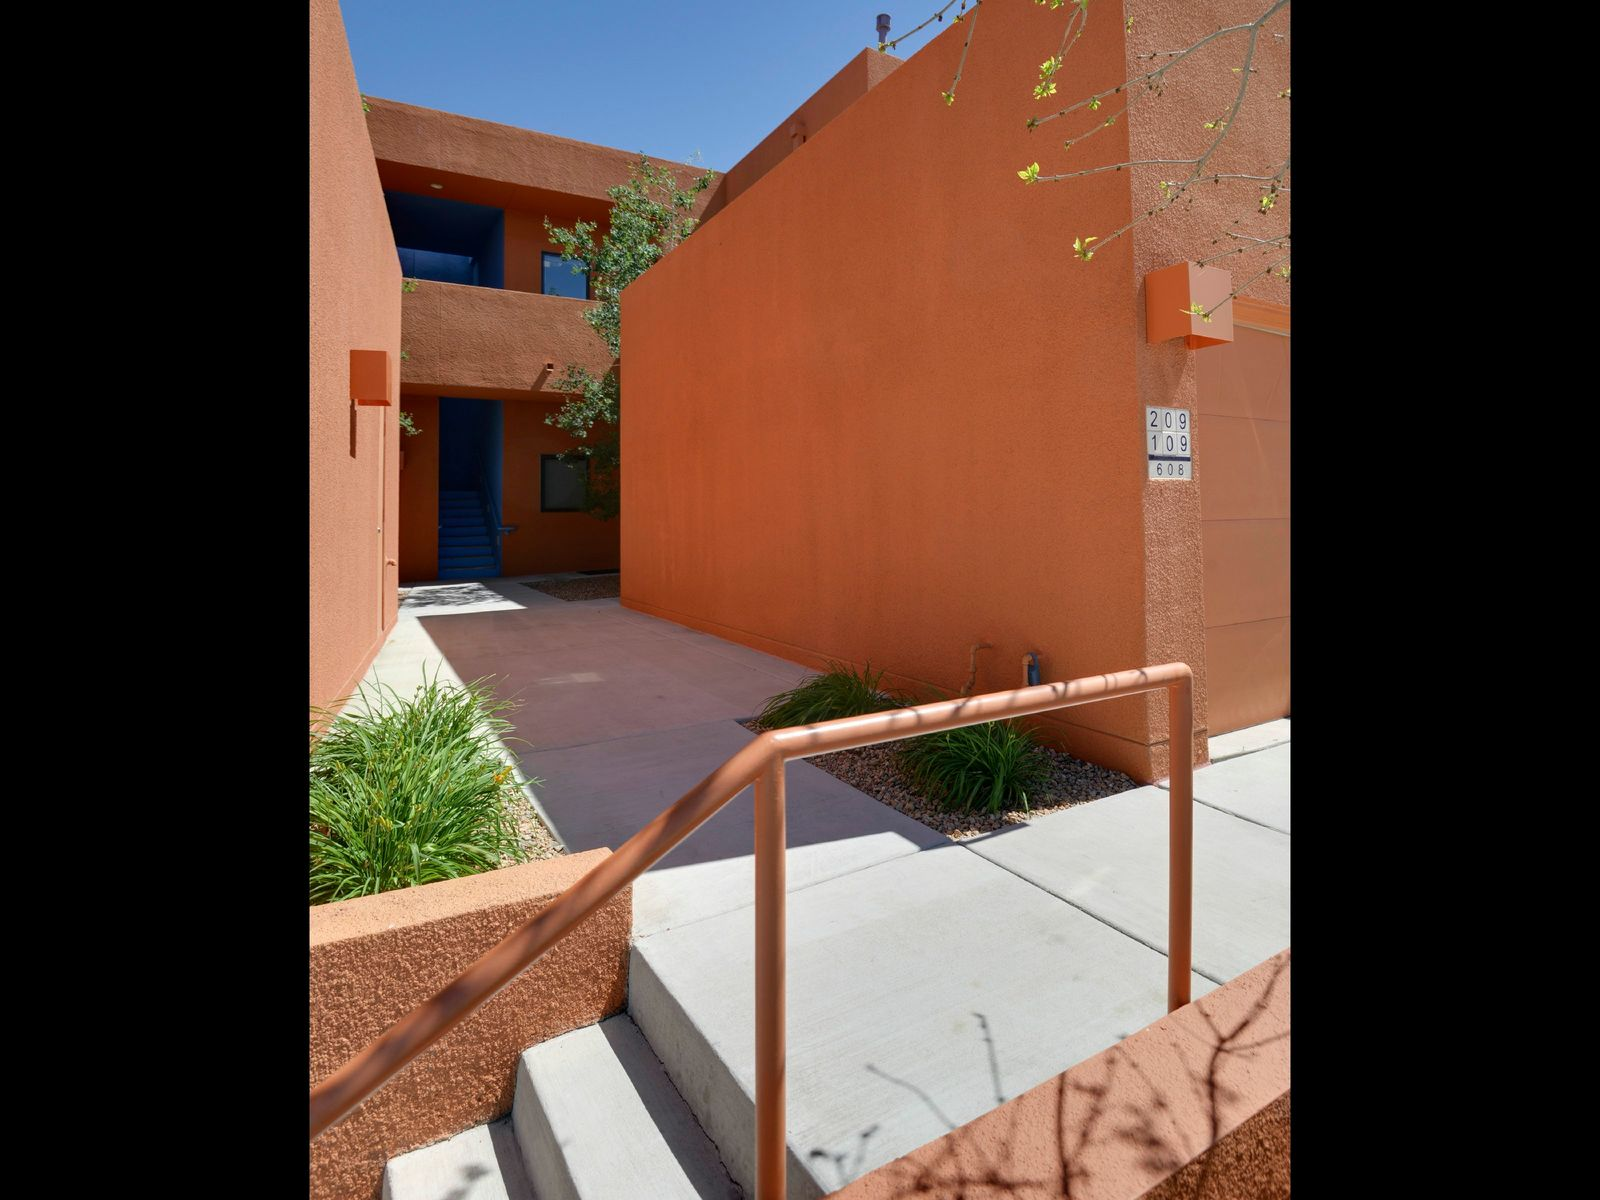 608 Avenida Villa Hermosa Unit 209